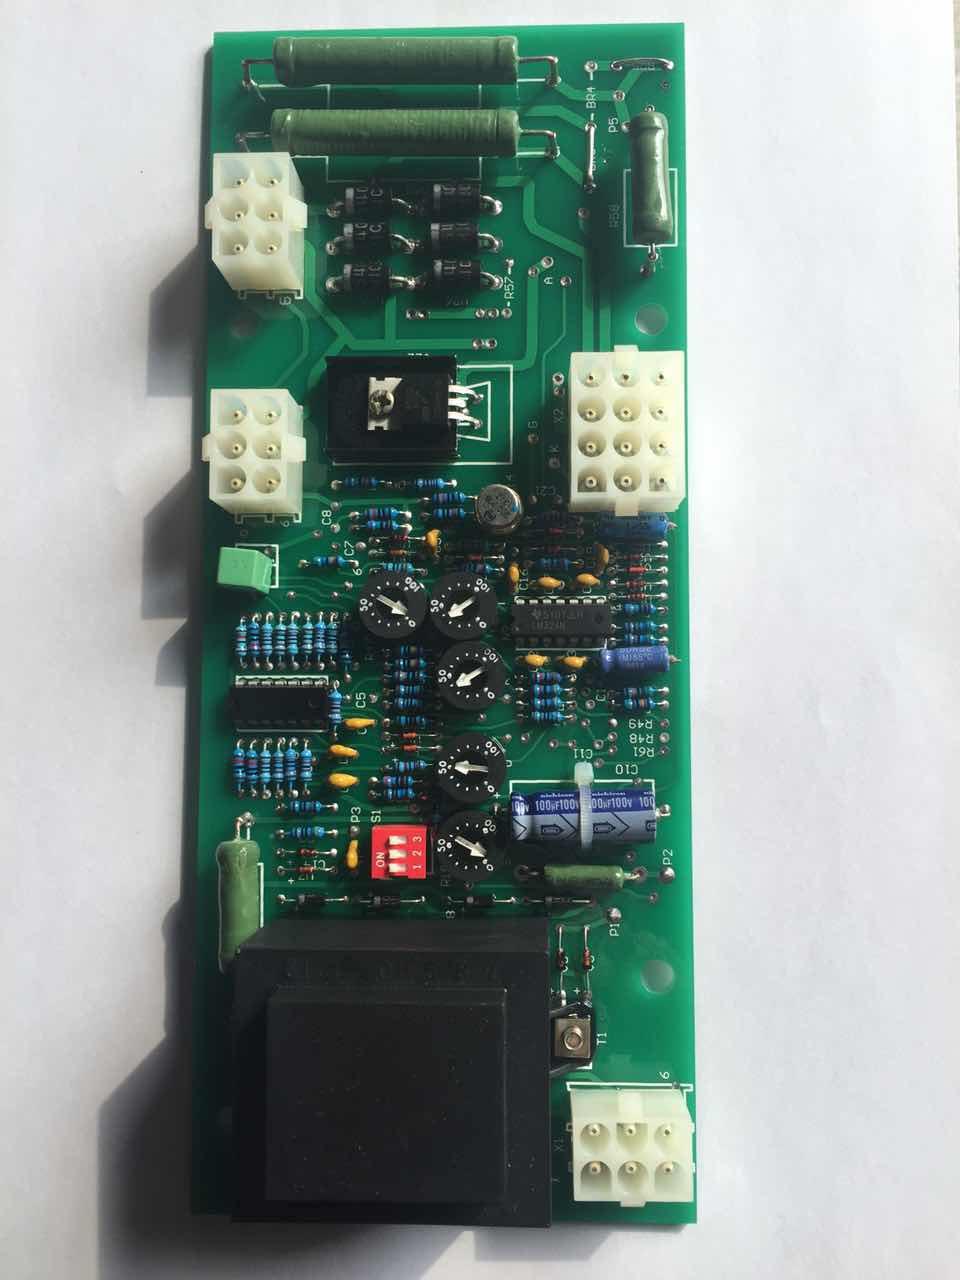 Envío Gratis AVR 6GA2491-1A 6GA2-491-1A 6GA2 491-1A 6GA2 491/1A 1FC6 generador repuestos regulador de voltaje automático Más V8.33 Tl866Ii Plus Universal Minipro programador Tl866 Nand Flash Avr foto Bios PROGRAMADOR Usb + 17 Uds adaptador